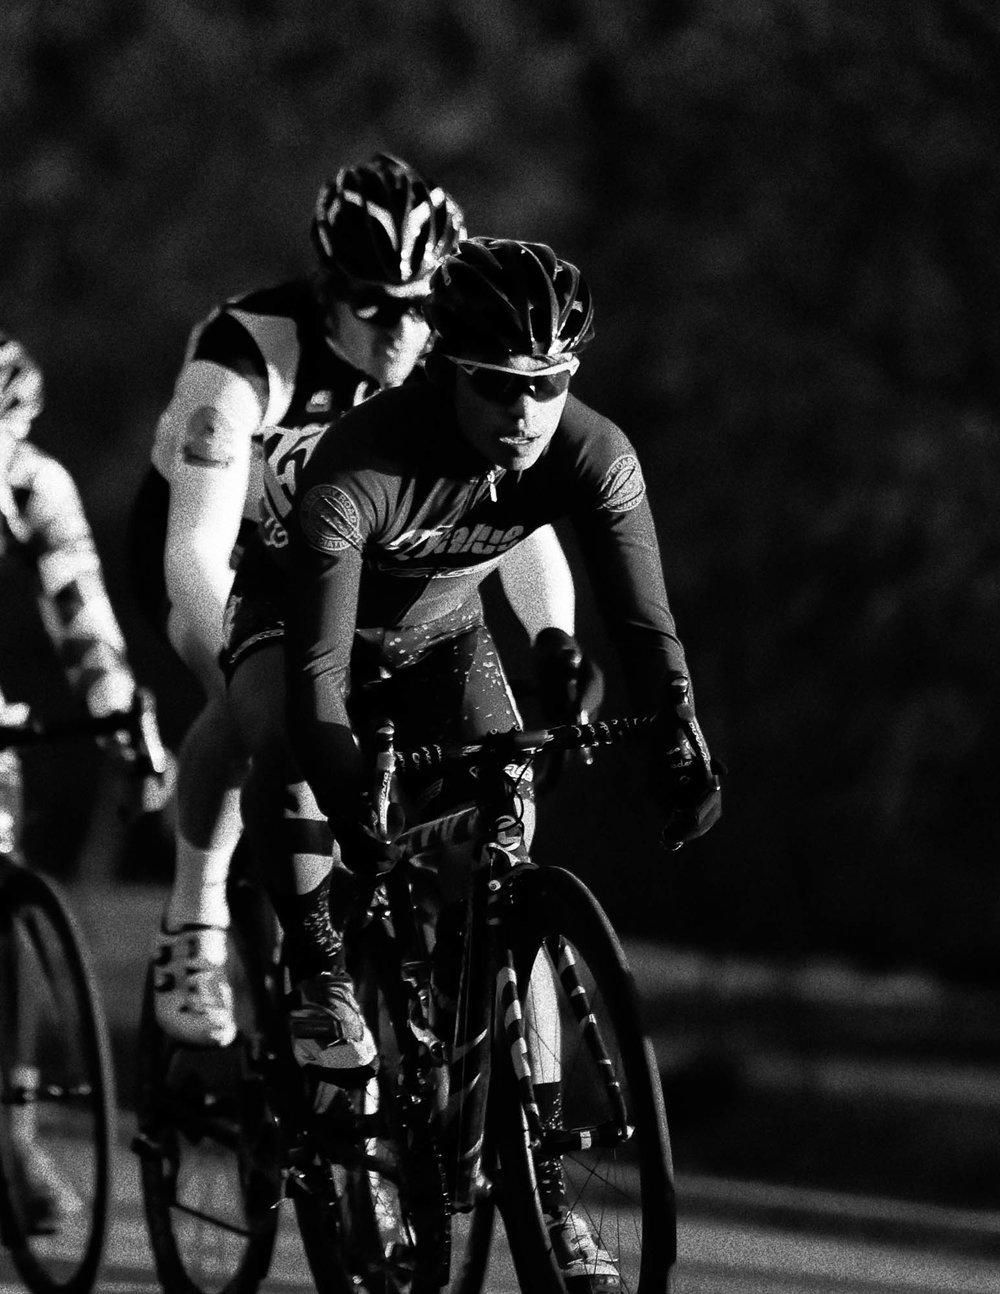 180422_Castelli_Series_Cycling_071.jpg